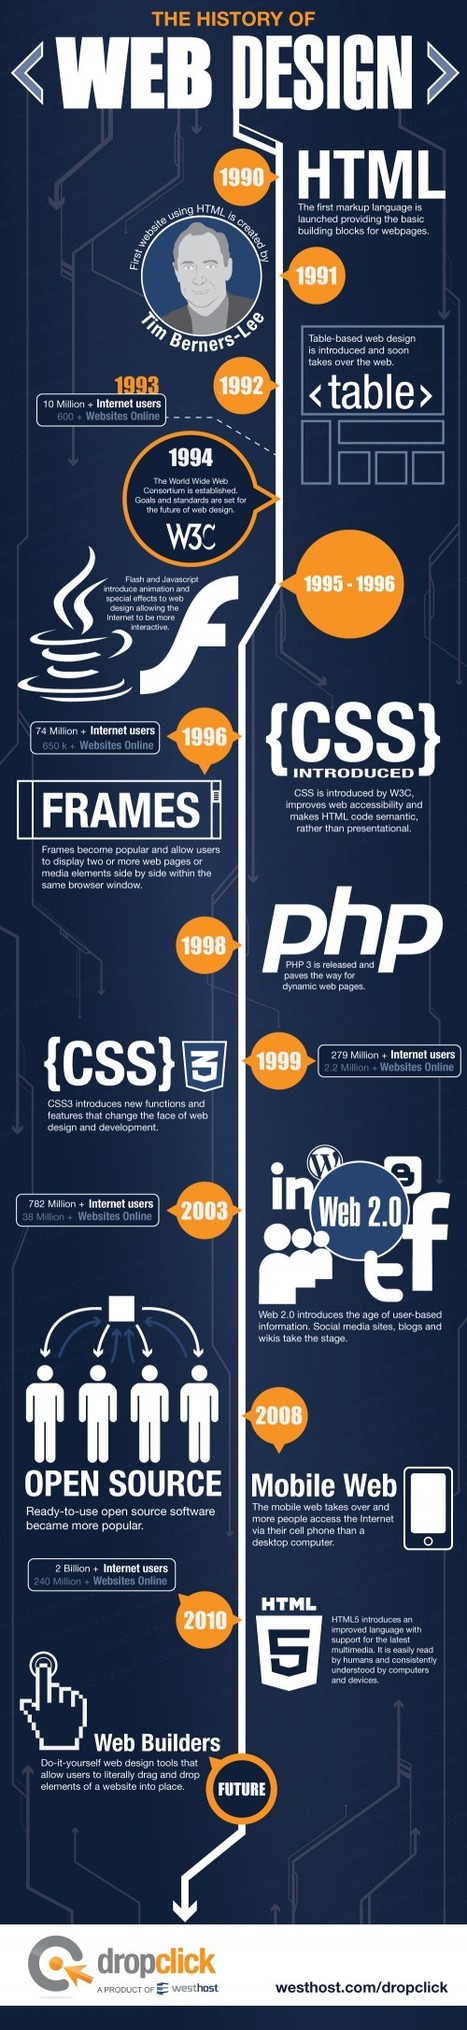 [Infographie] L'histoire du Webdesign - Websourcing.fr | Les infographies ! | Scoop.it